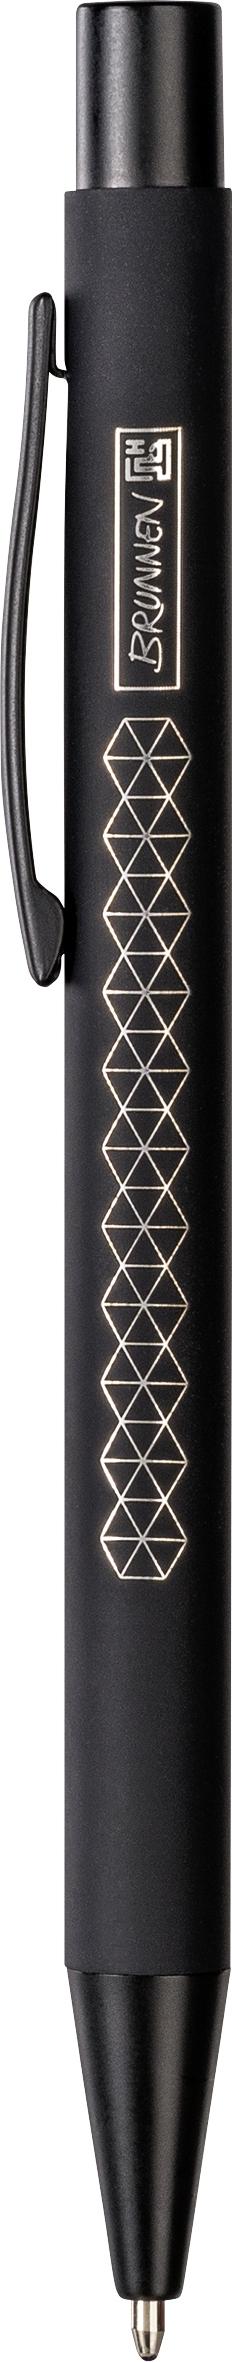 Kugelschreiber Xtreme